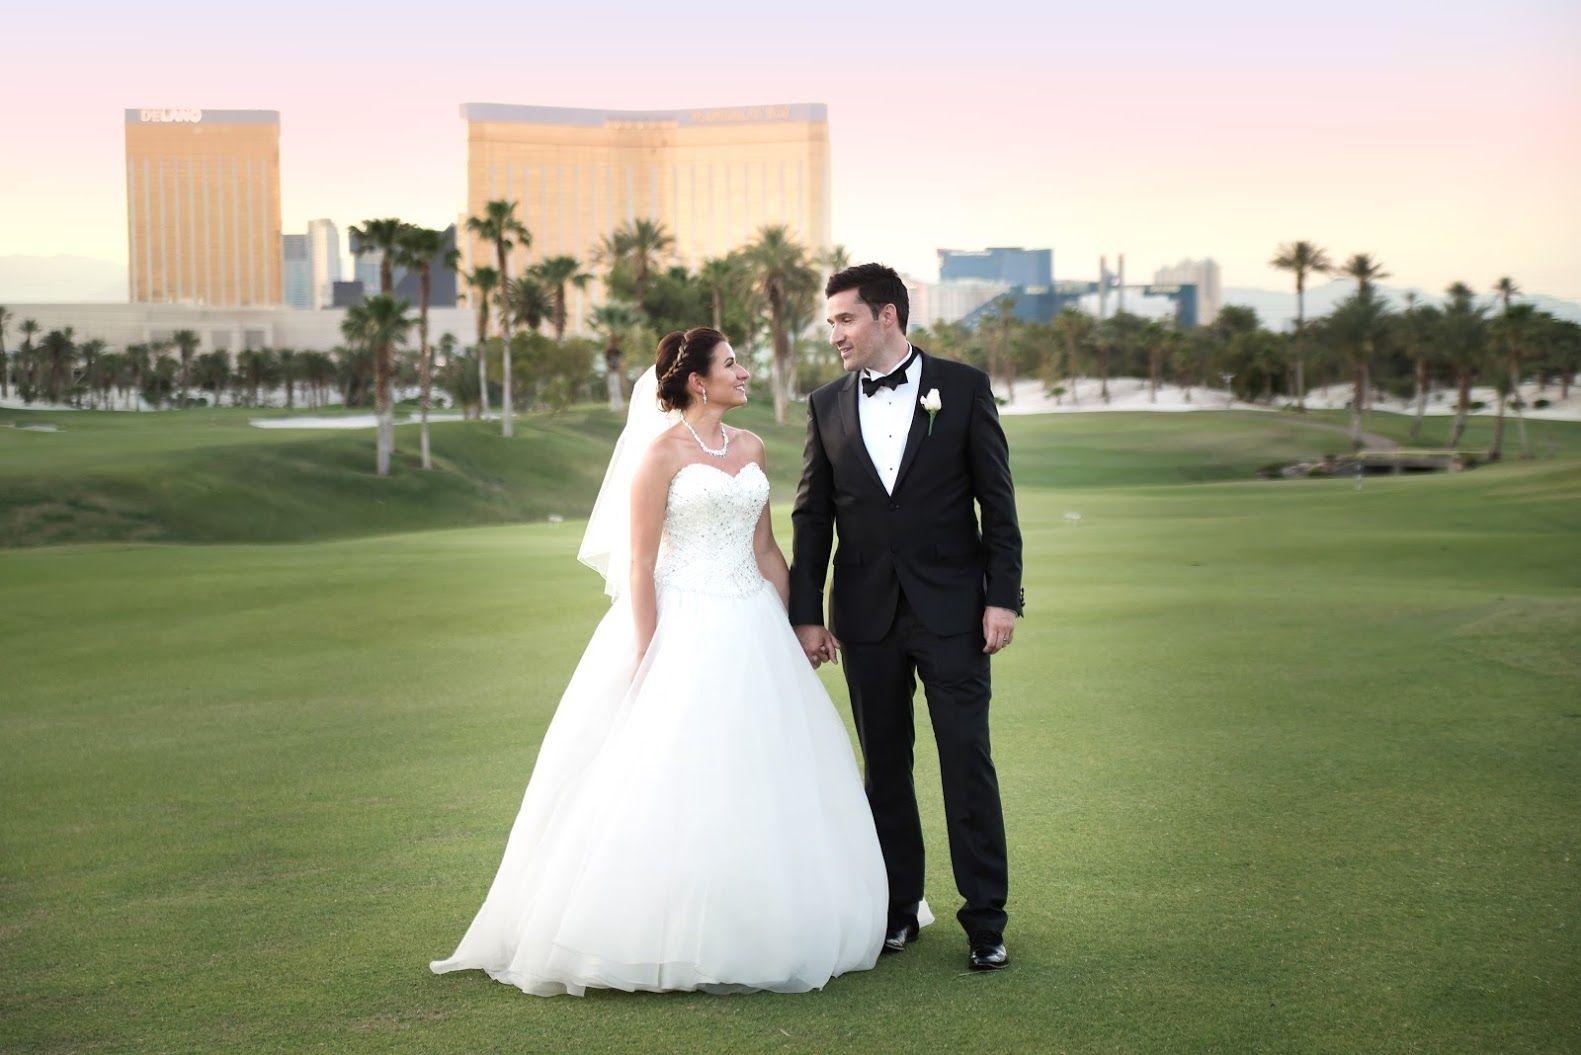 The Bride And Groom On Greens Of Bali Hai Golf Club See More Las Vegas Wedding